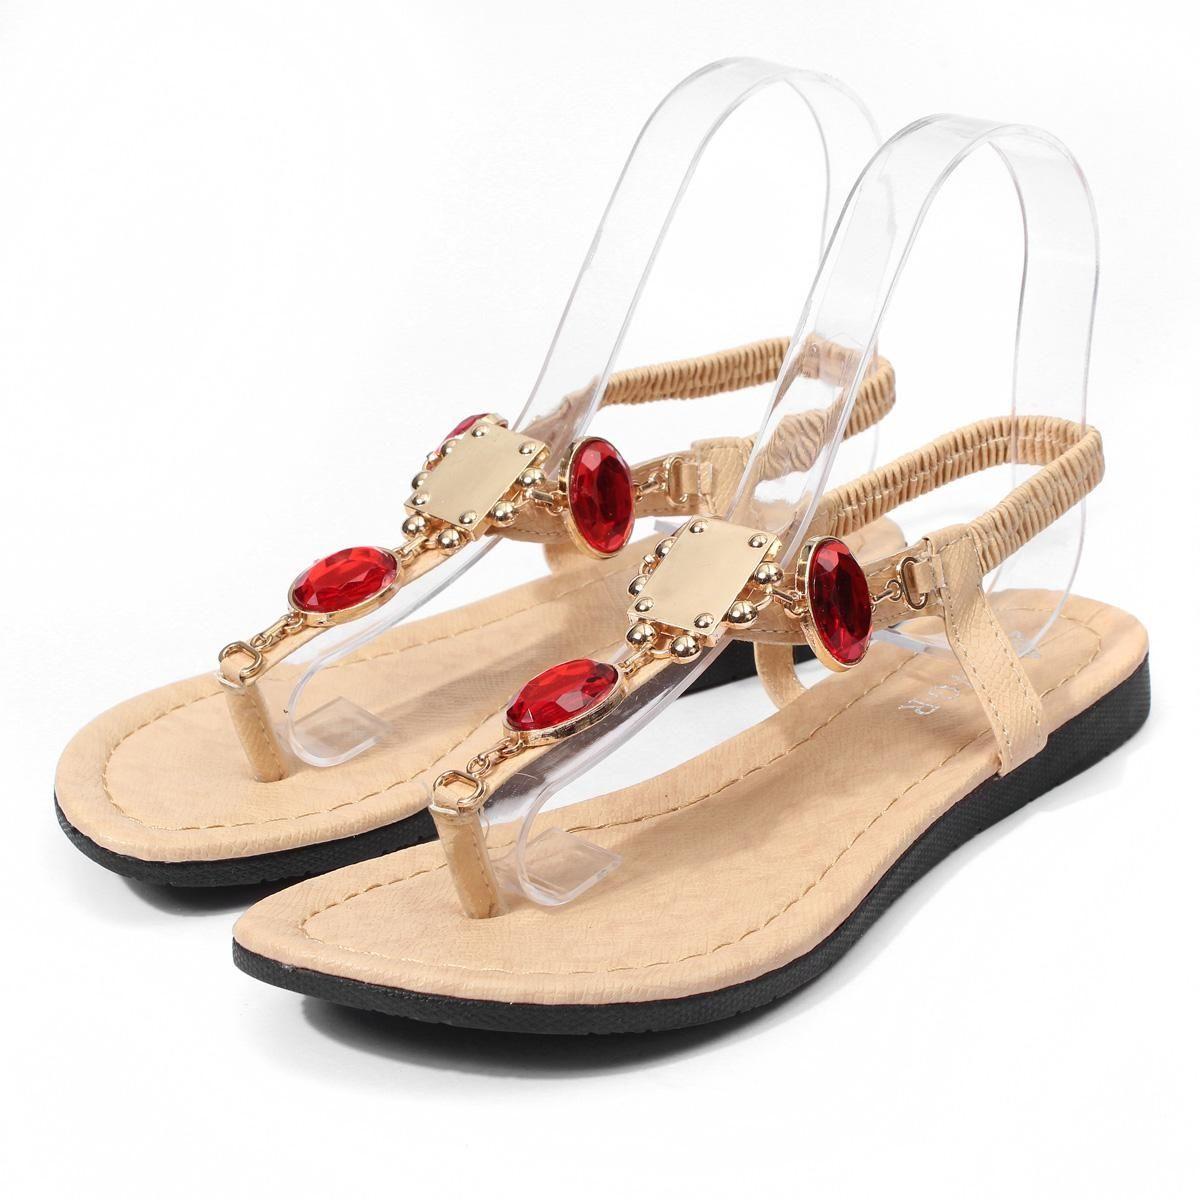 687befa8088979 Buy Fashion New Summer Womens T-Strap Sandals Shoes Sparking Diamond Flat  Beach Flip Flops